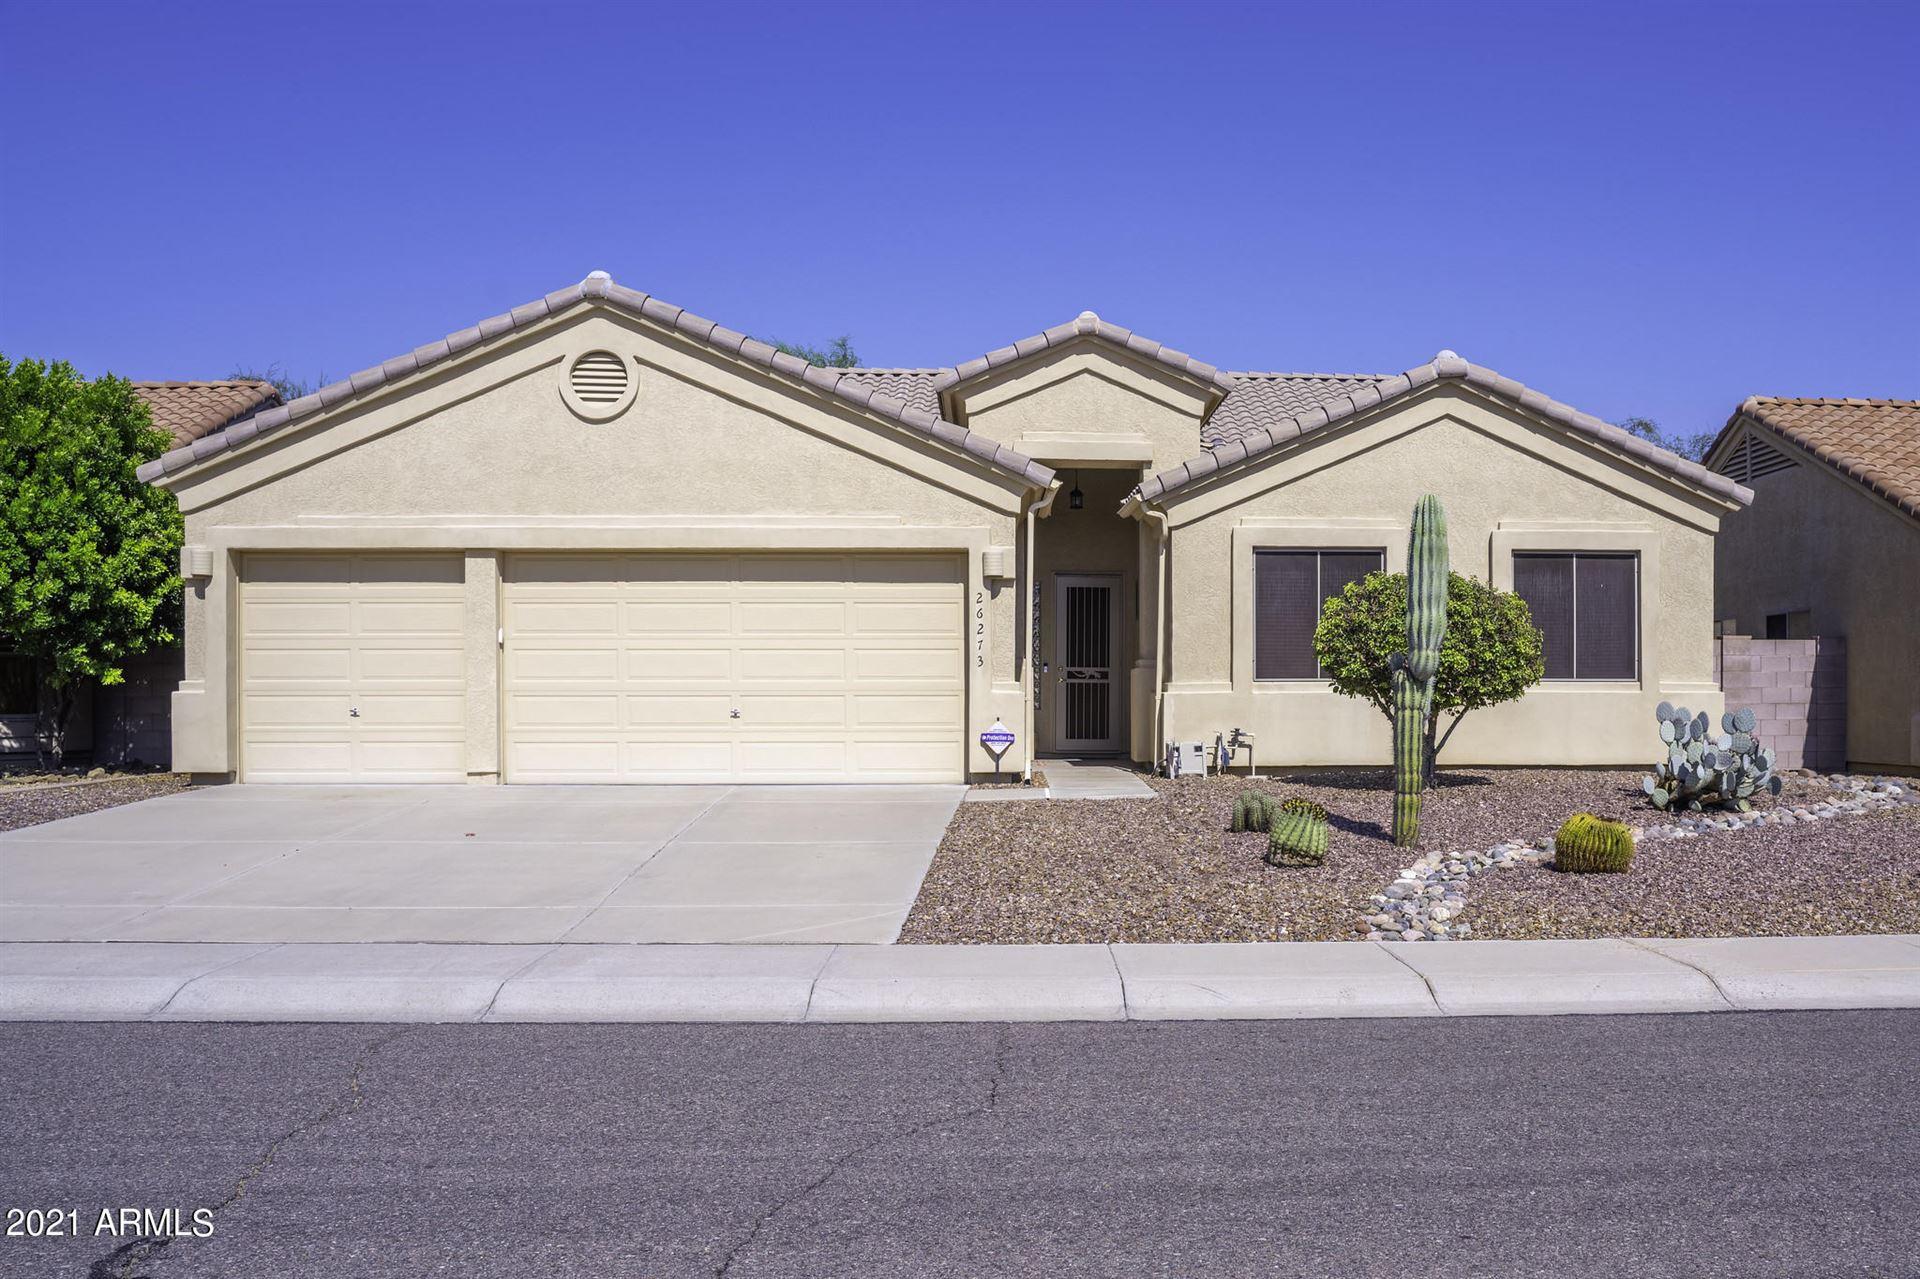 26273 N 47TH Place, Phoenix, AZ 85050 - MLS#: 6274163